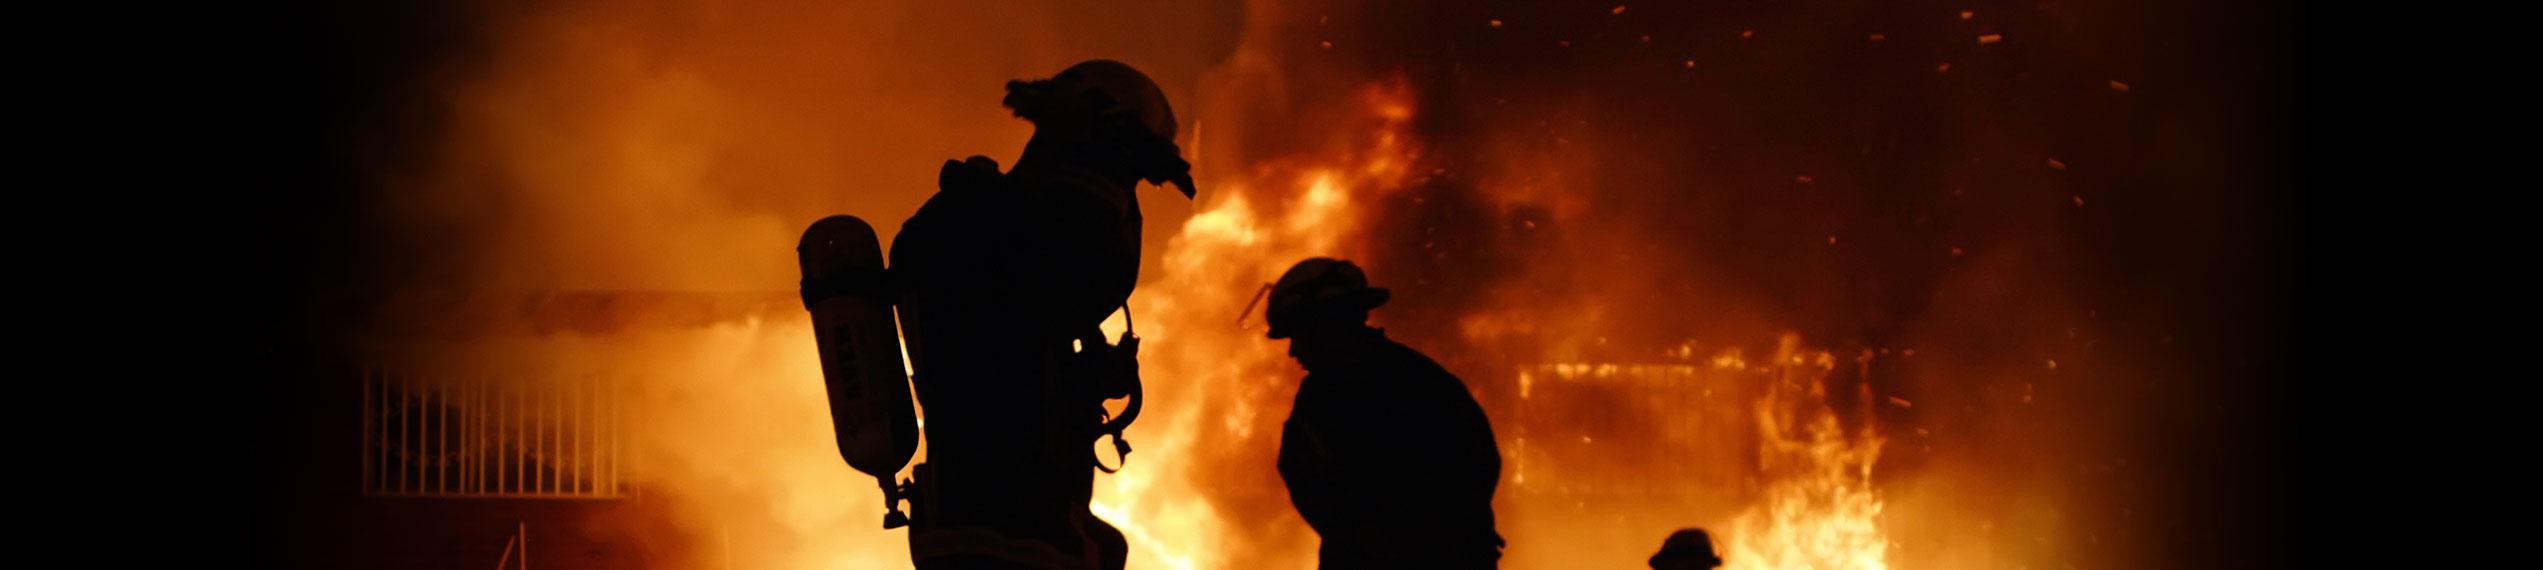 Fire Damage Repair by Paul Davis